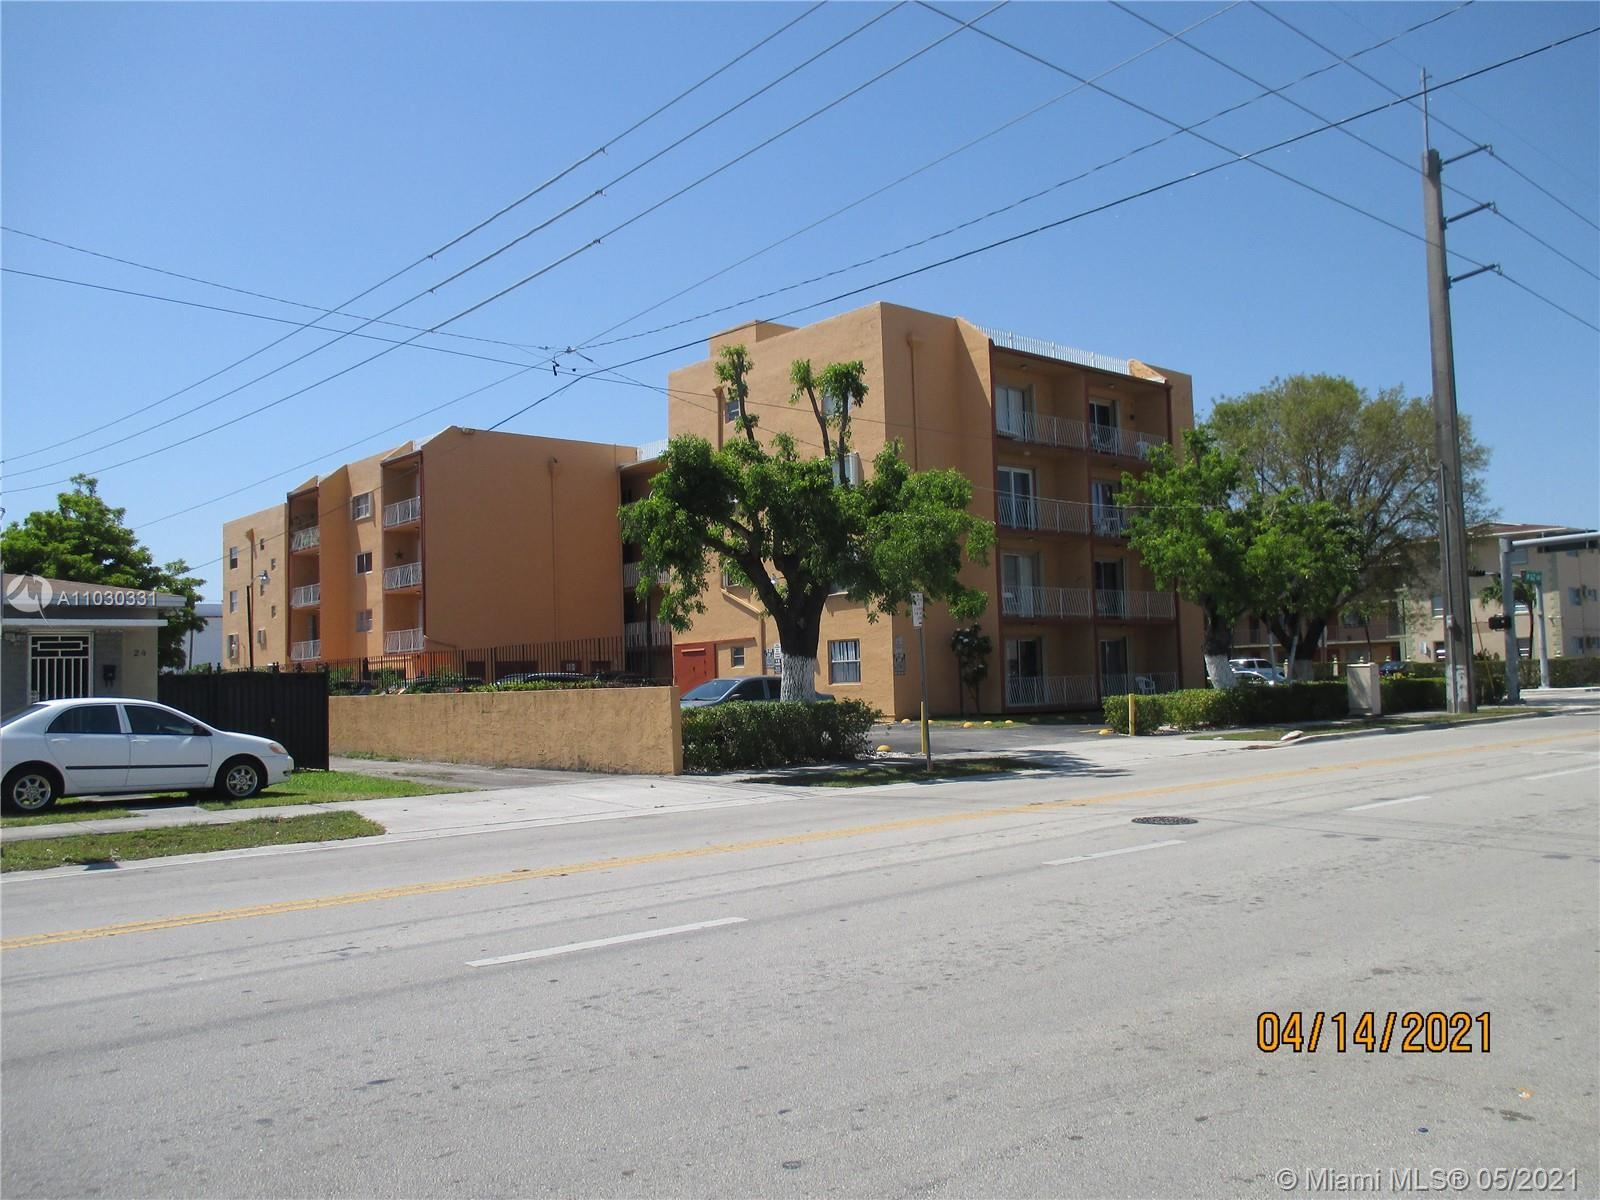 6200 W Flagler St #205, Miami, FL 33144 - #: A11030331